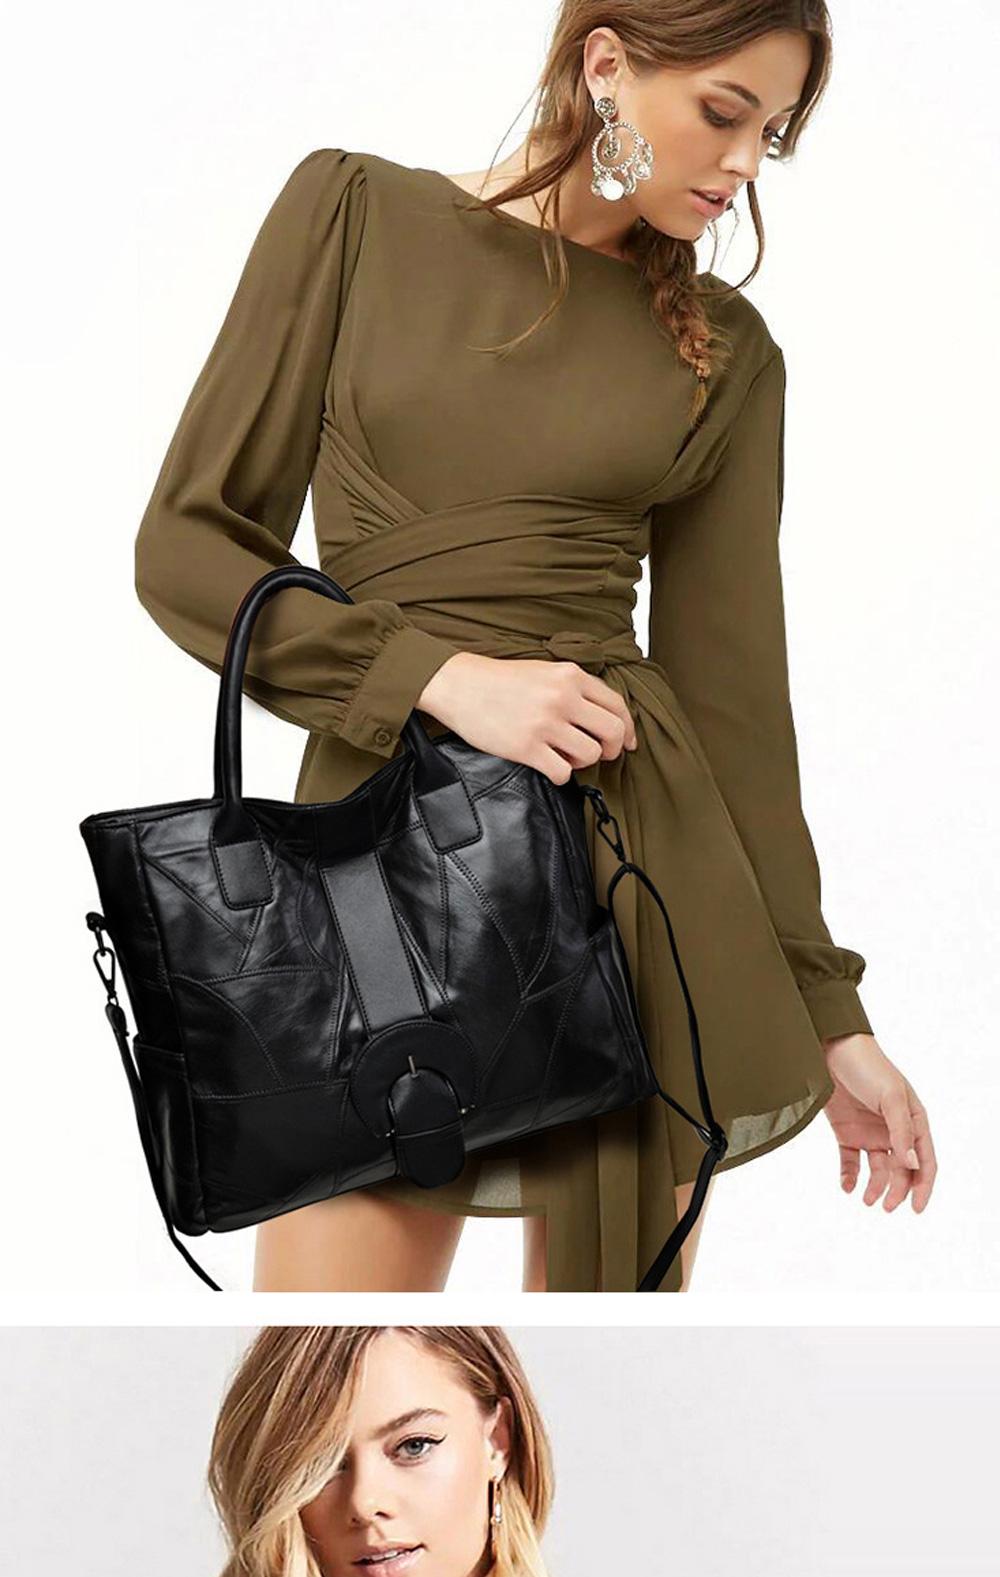 Genuine Leather Handbags Sheepskin Tote Bags, New Large-capacity Shoulder Handbags, Mommy bags Designed for women 33*10*31cm 1